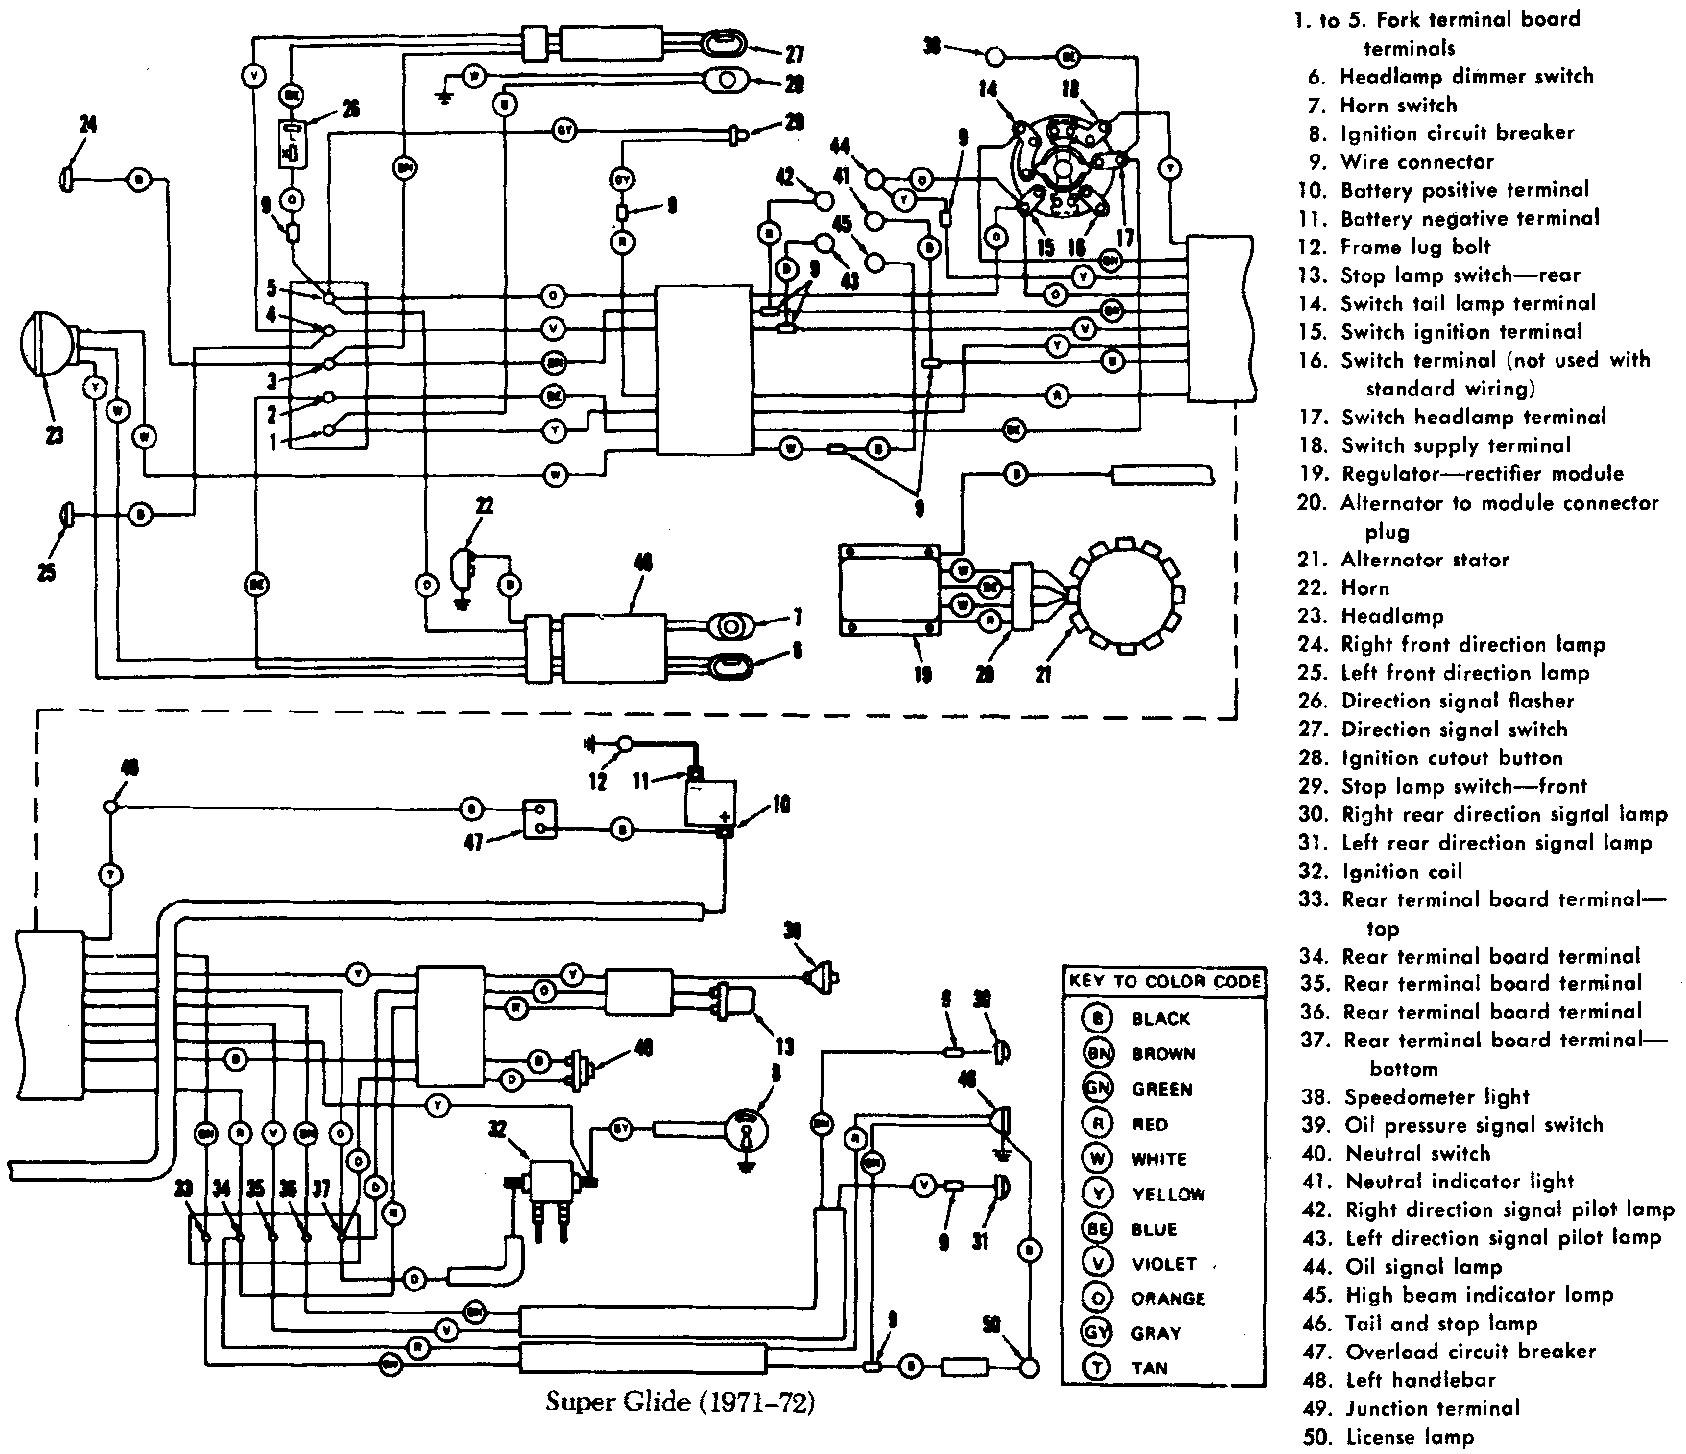 1995 harley davidson sportster wiring diagram free download wiring